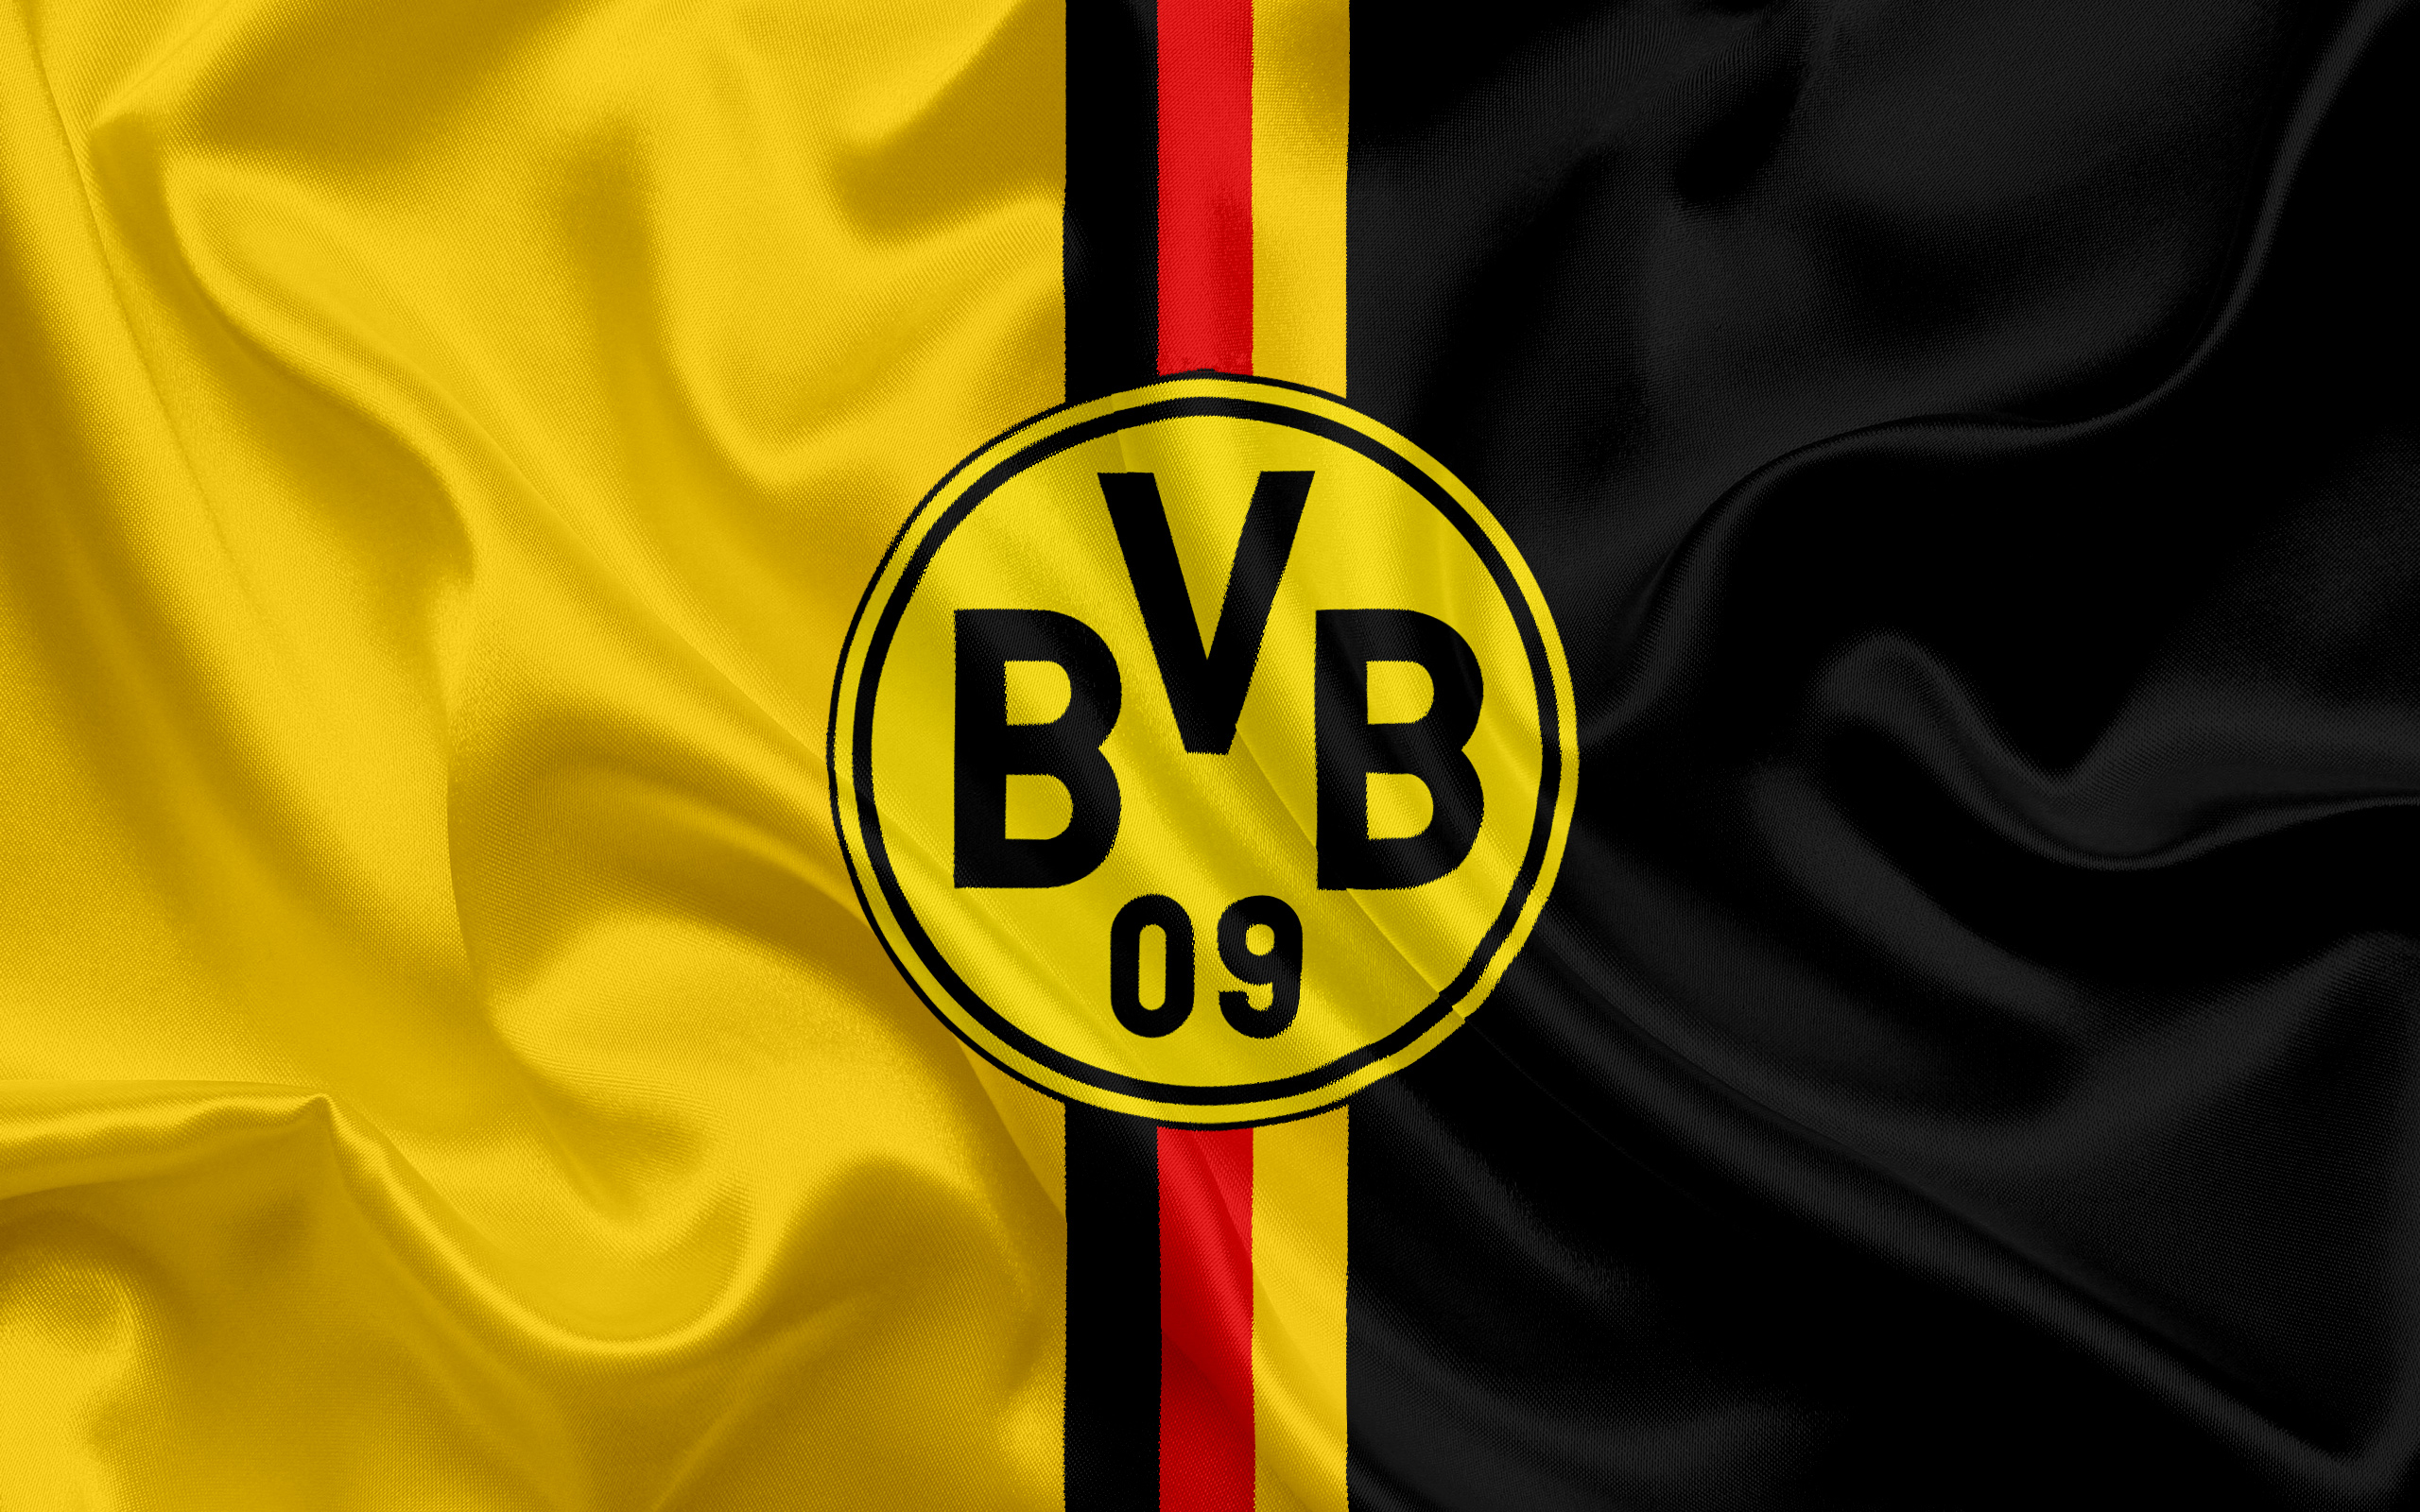 Borussia Dortmund HD Wallpaper Background Image 2560x1600 ID 2560x1600